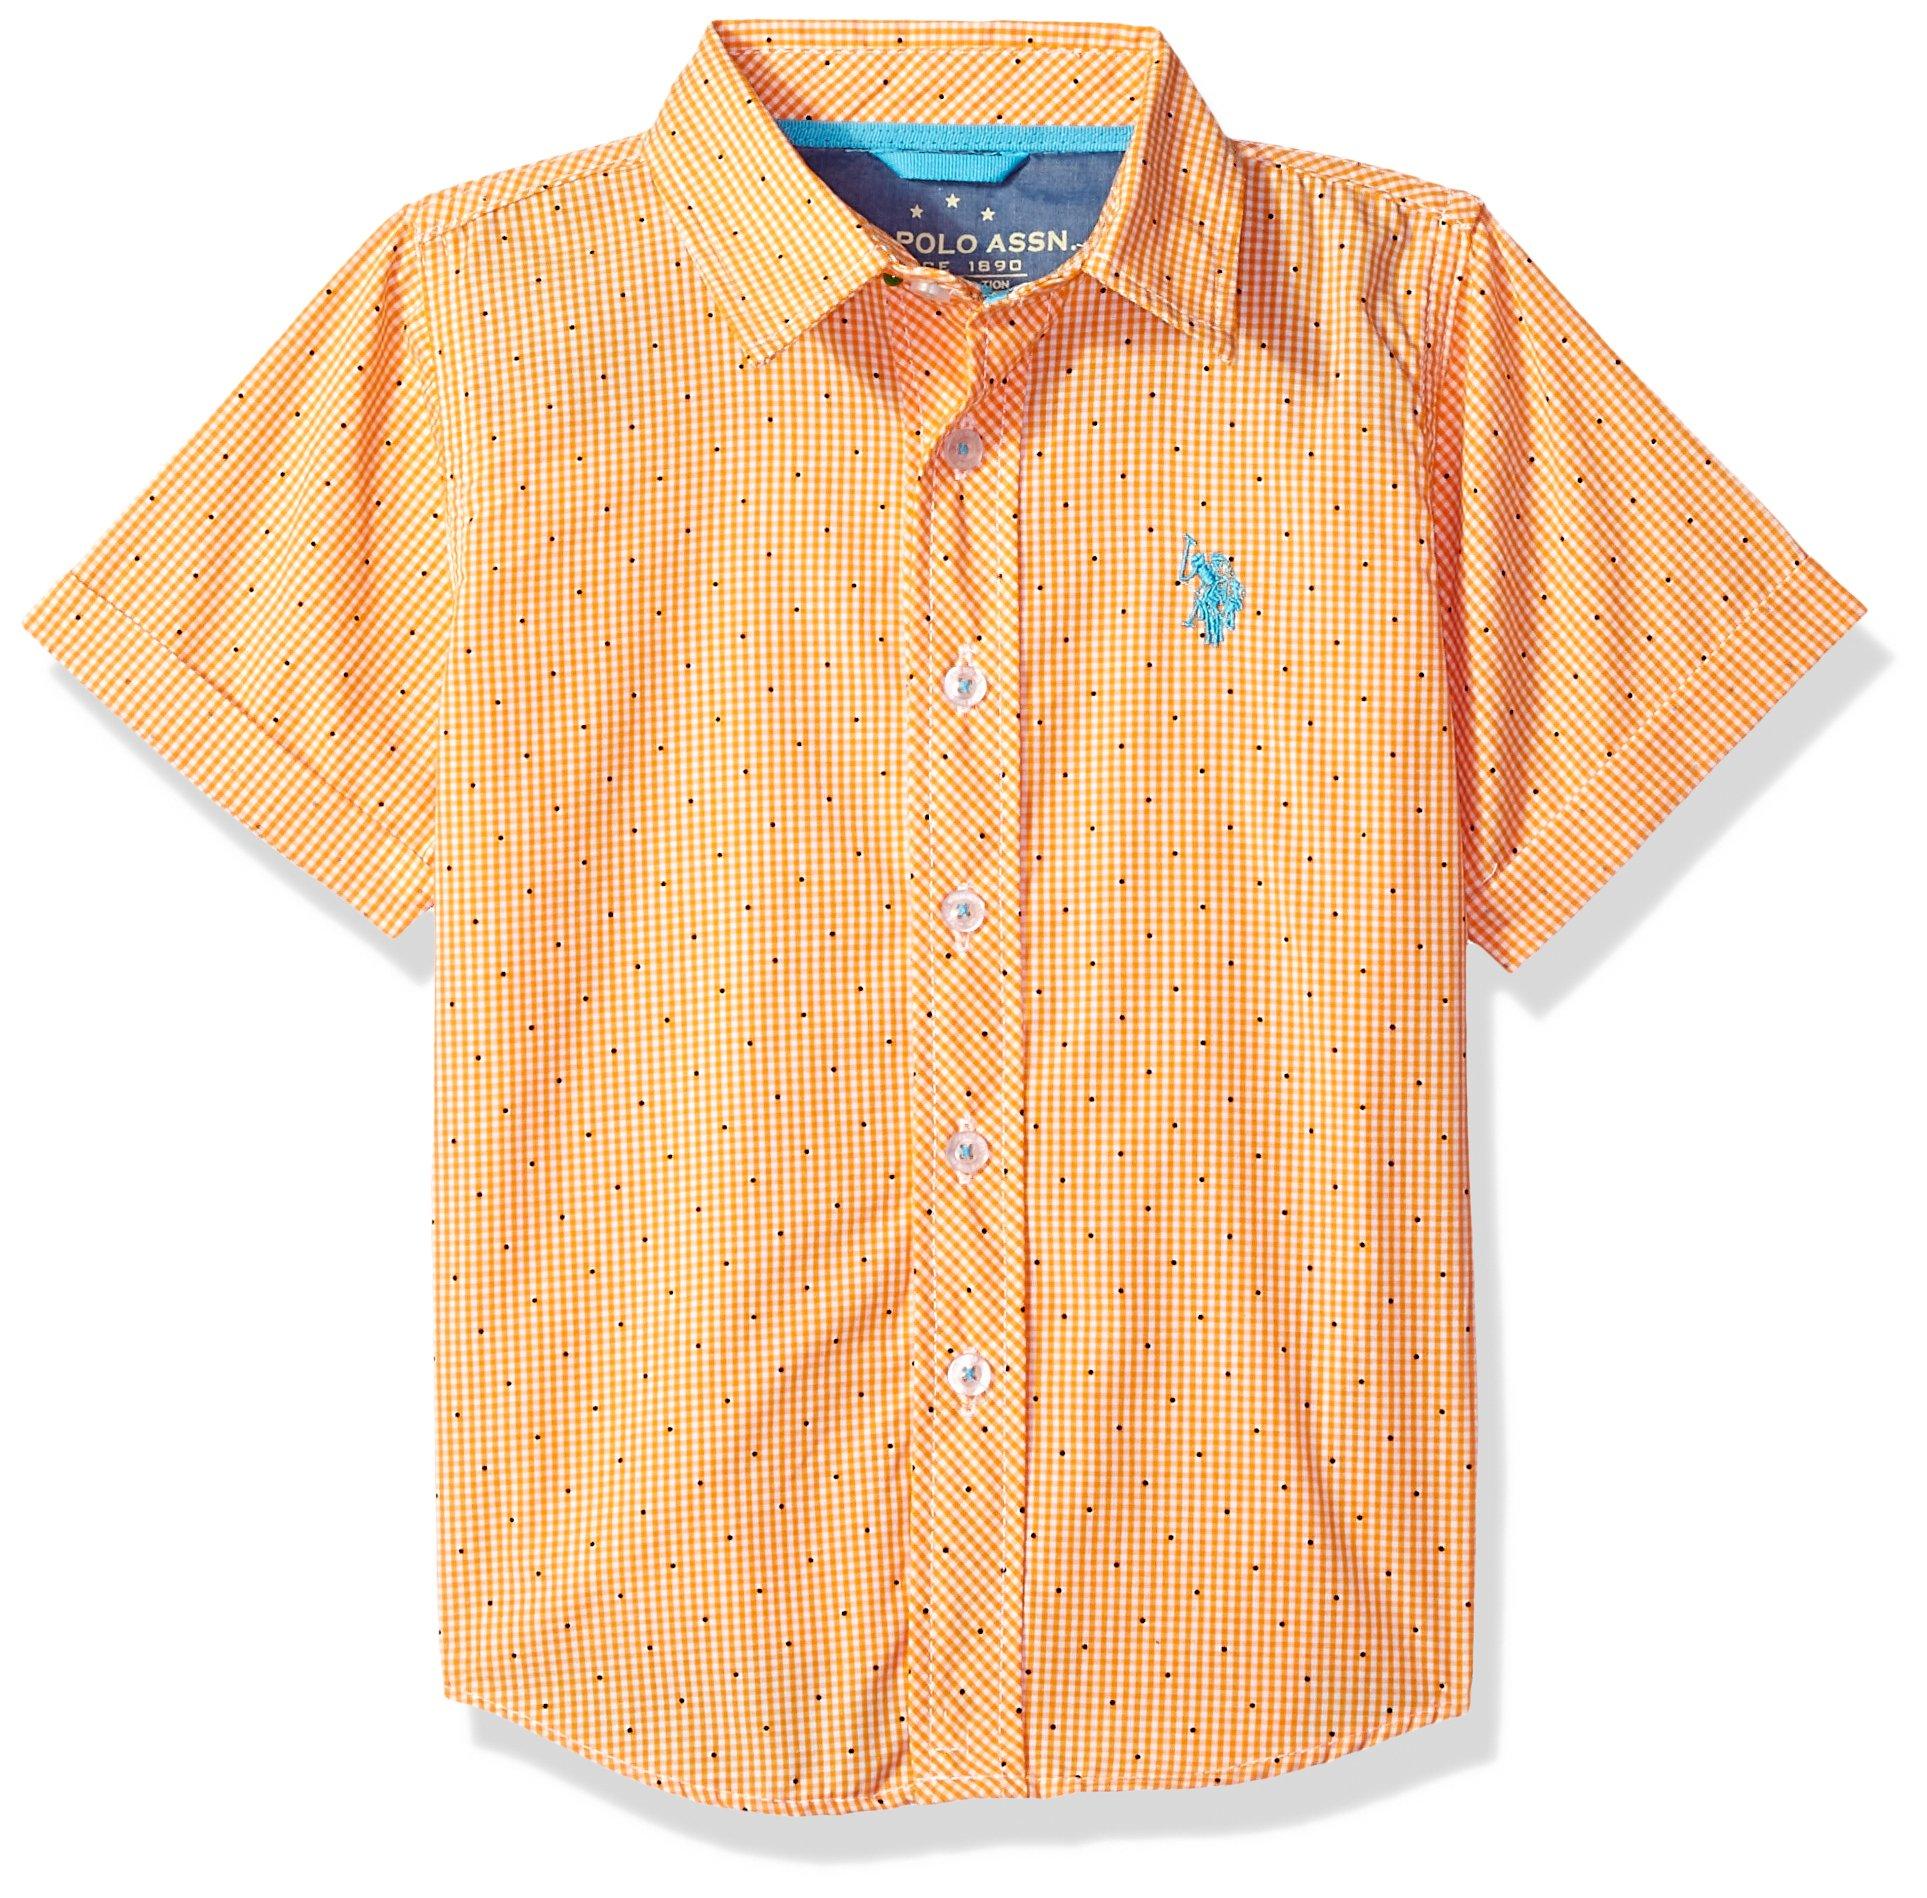 U.S. Polo Assn. Boys' Toddler Short Sleeve Plaid Sport Shirt, Check dots Warhol Orange, 4T